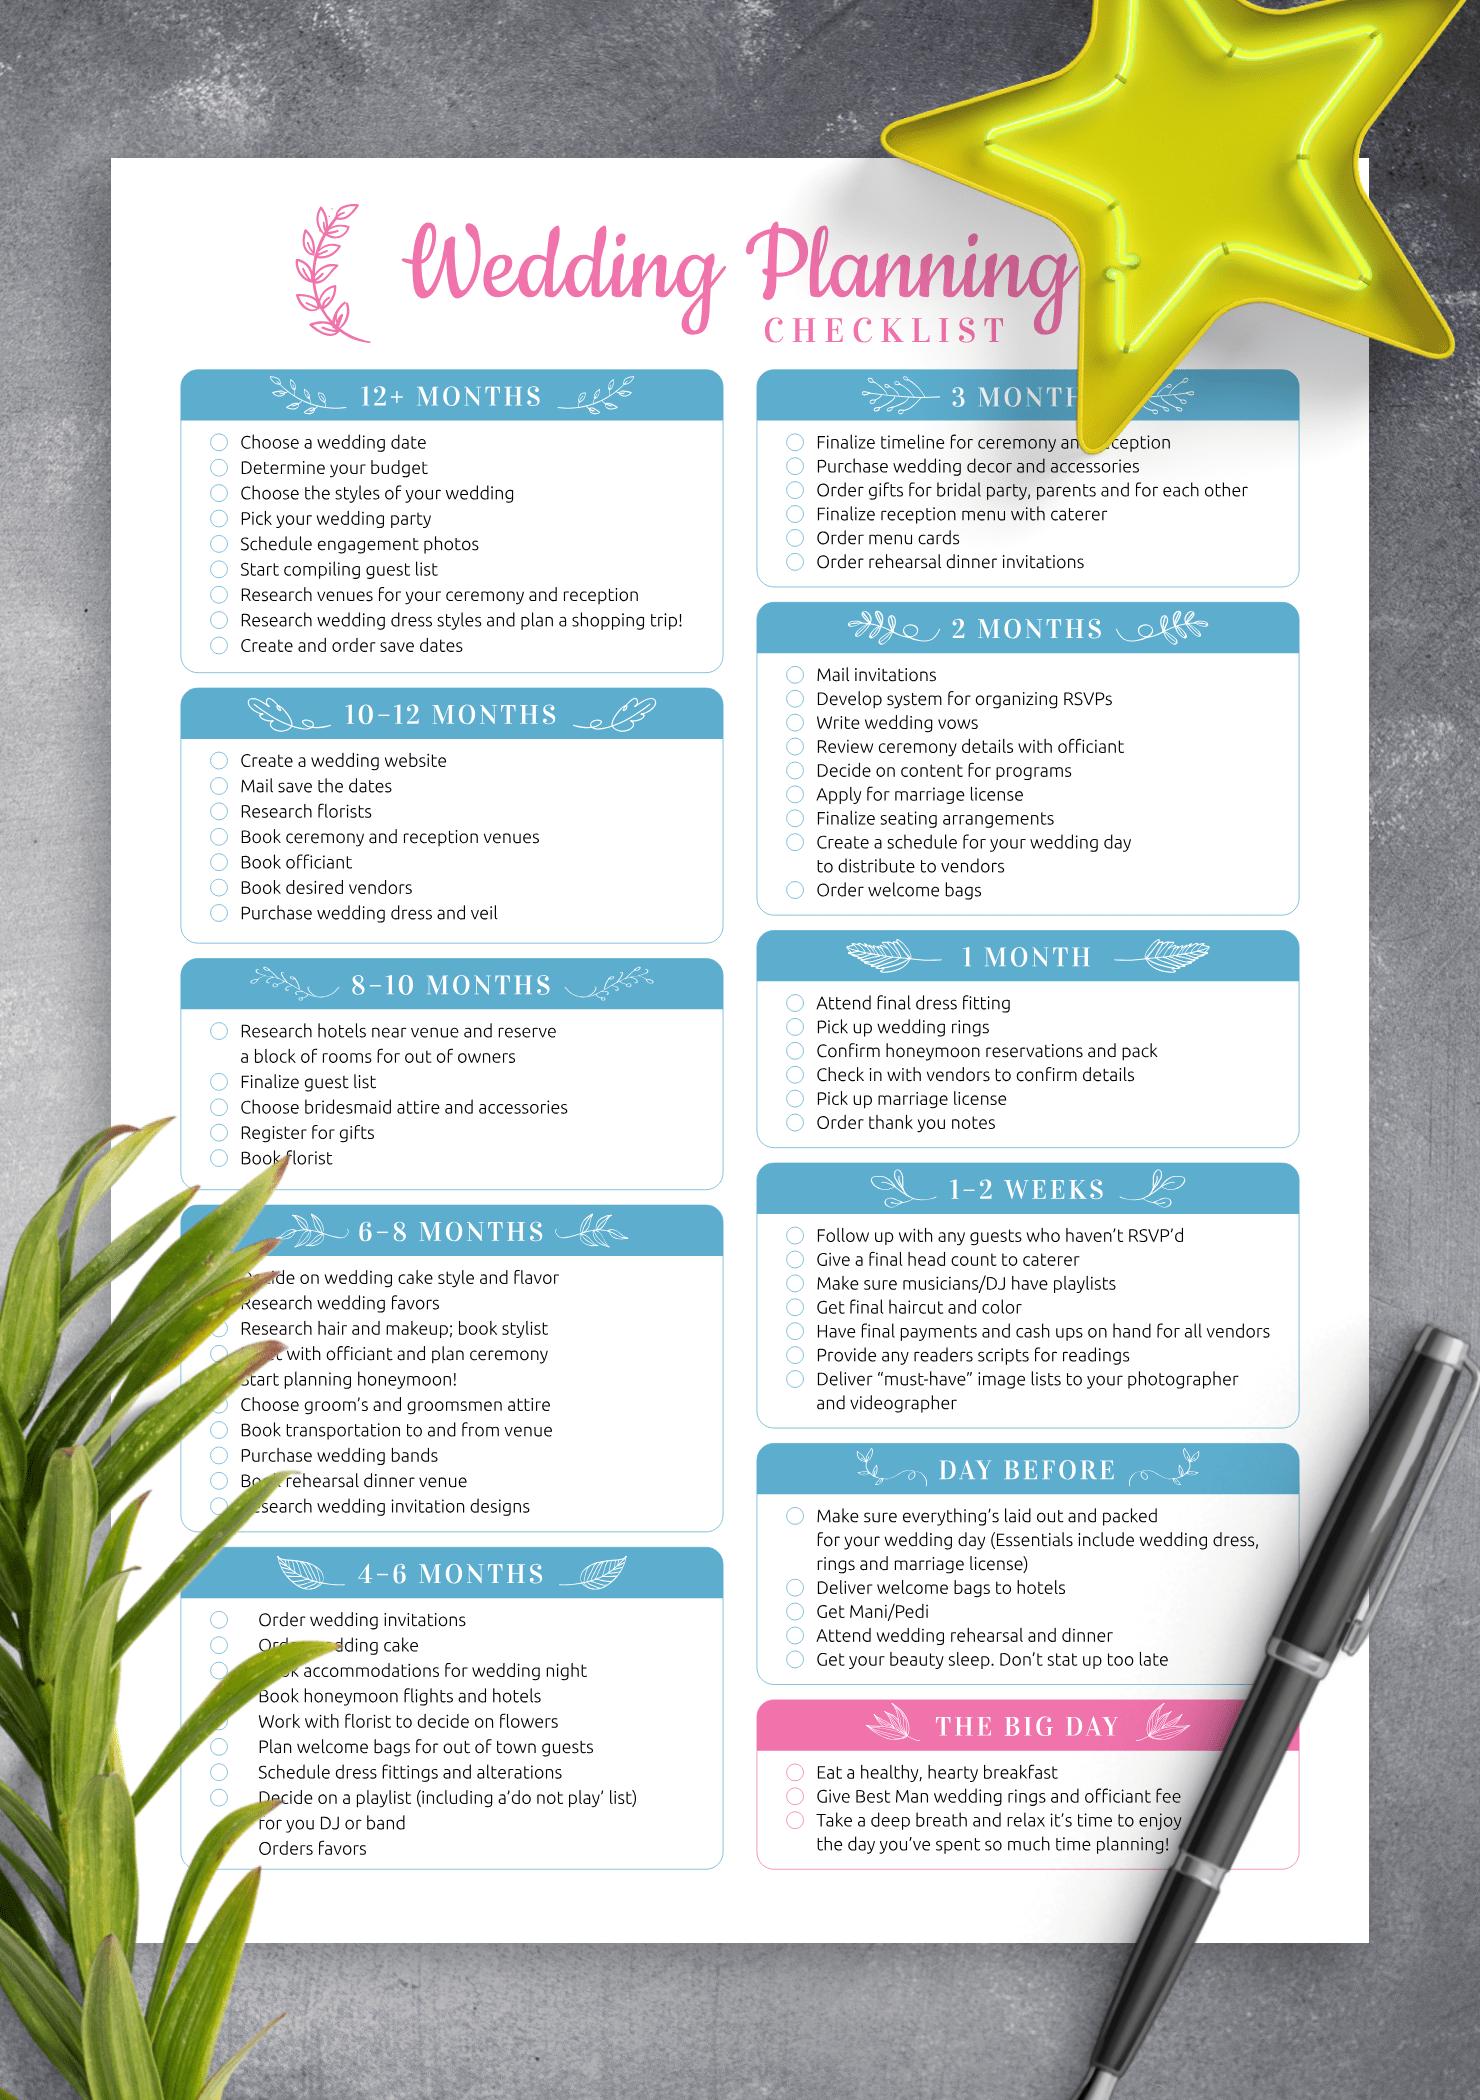 Download Printable Wedding Planning Checklist